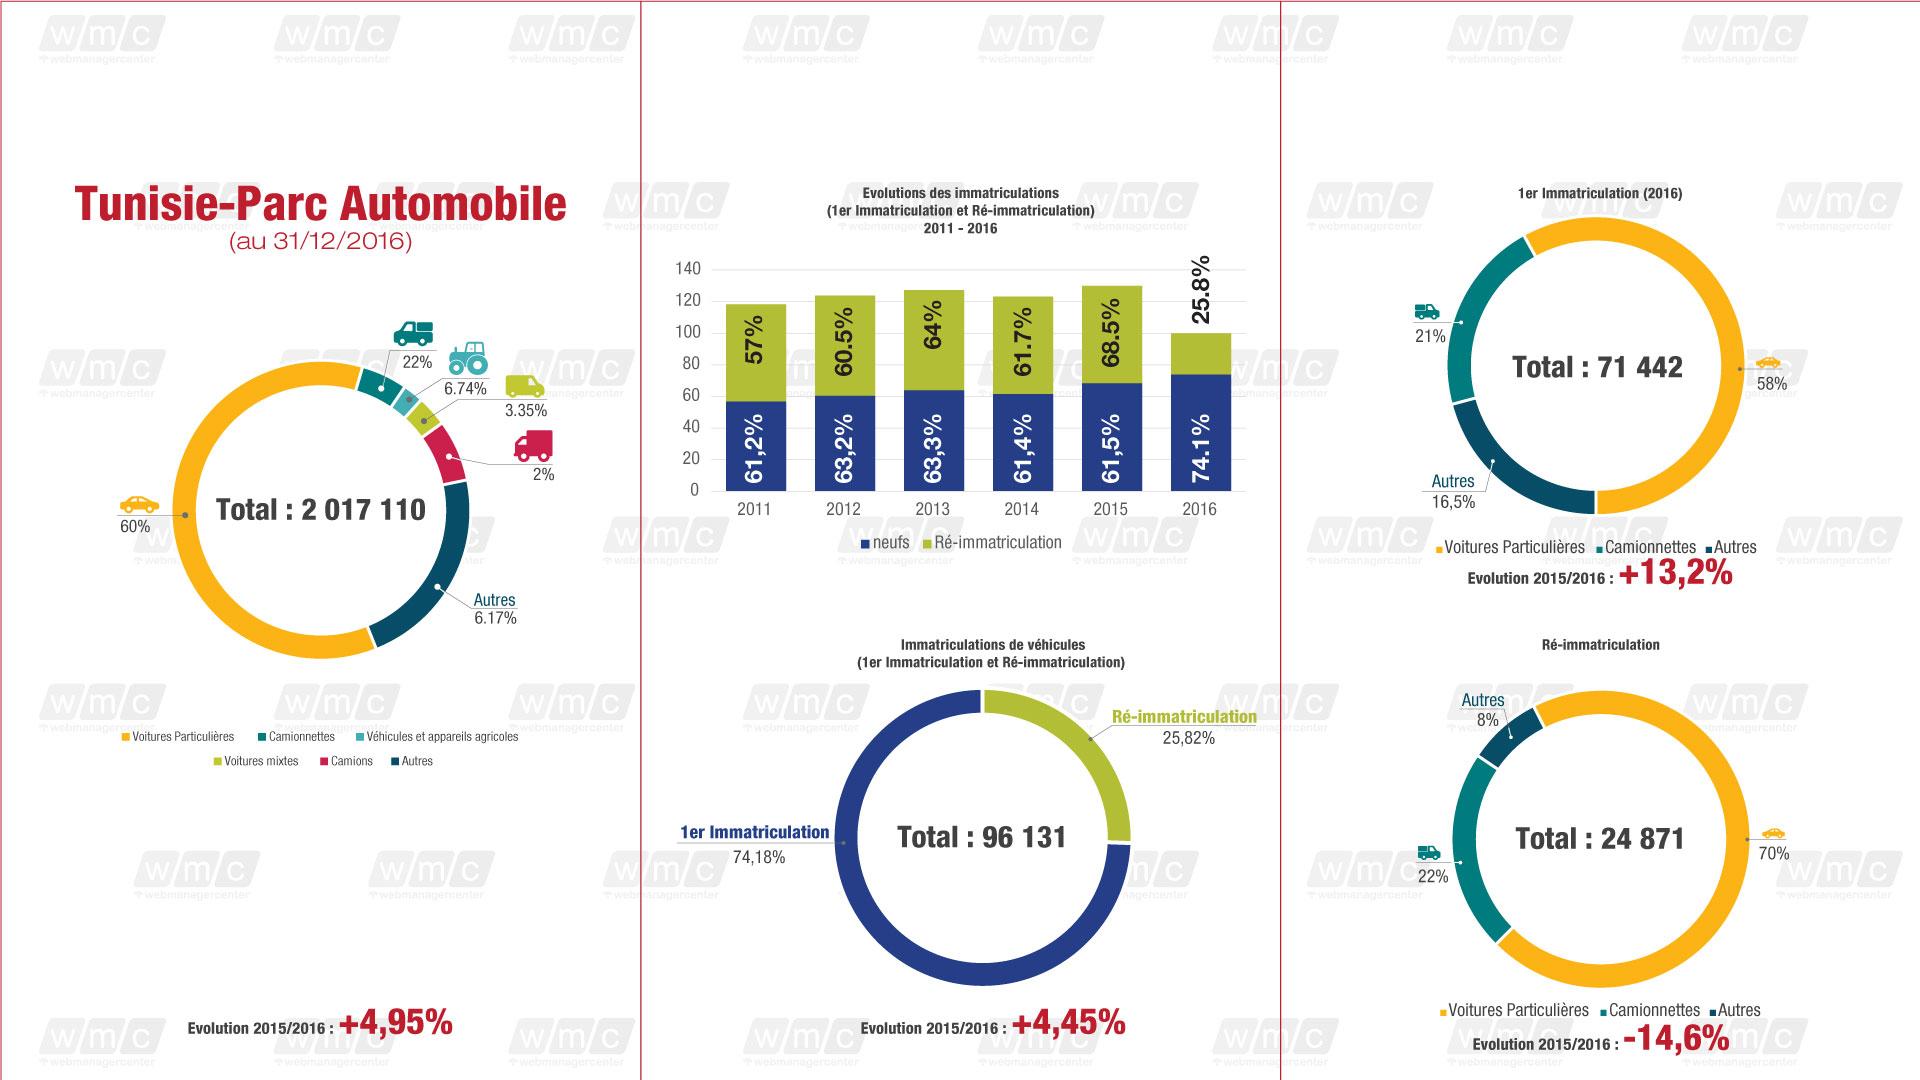 infographie parc automobile tunisien webmanagercenter. Black Bedroom Furniture Sets. Home Design Ideas